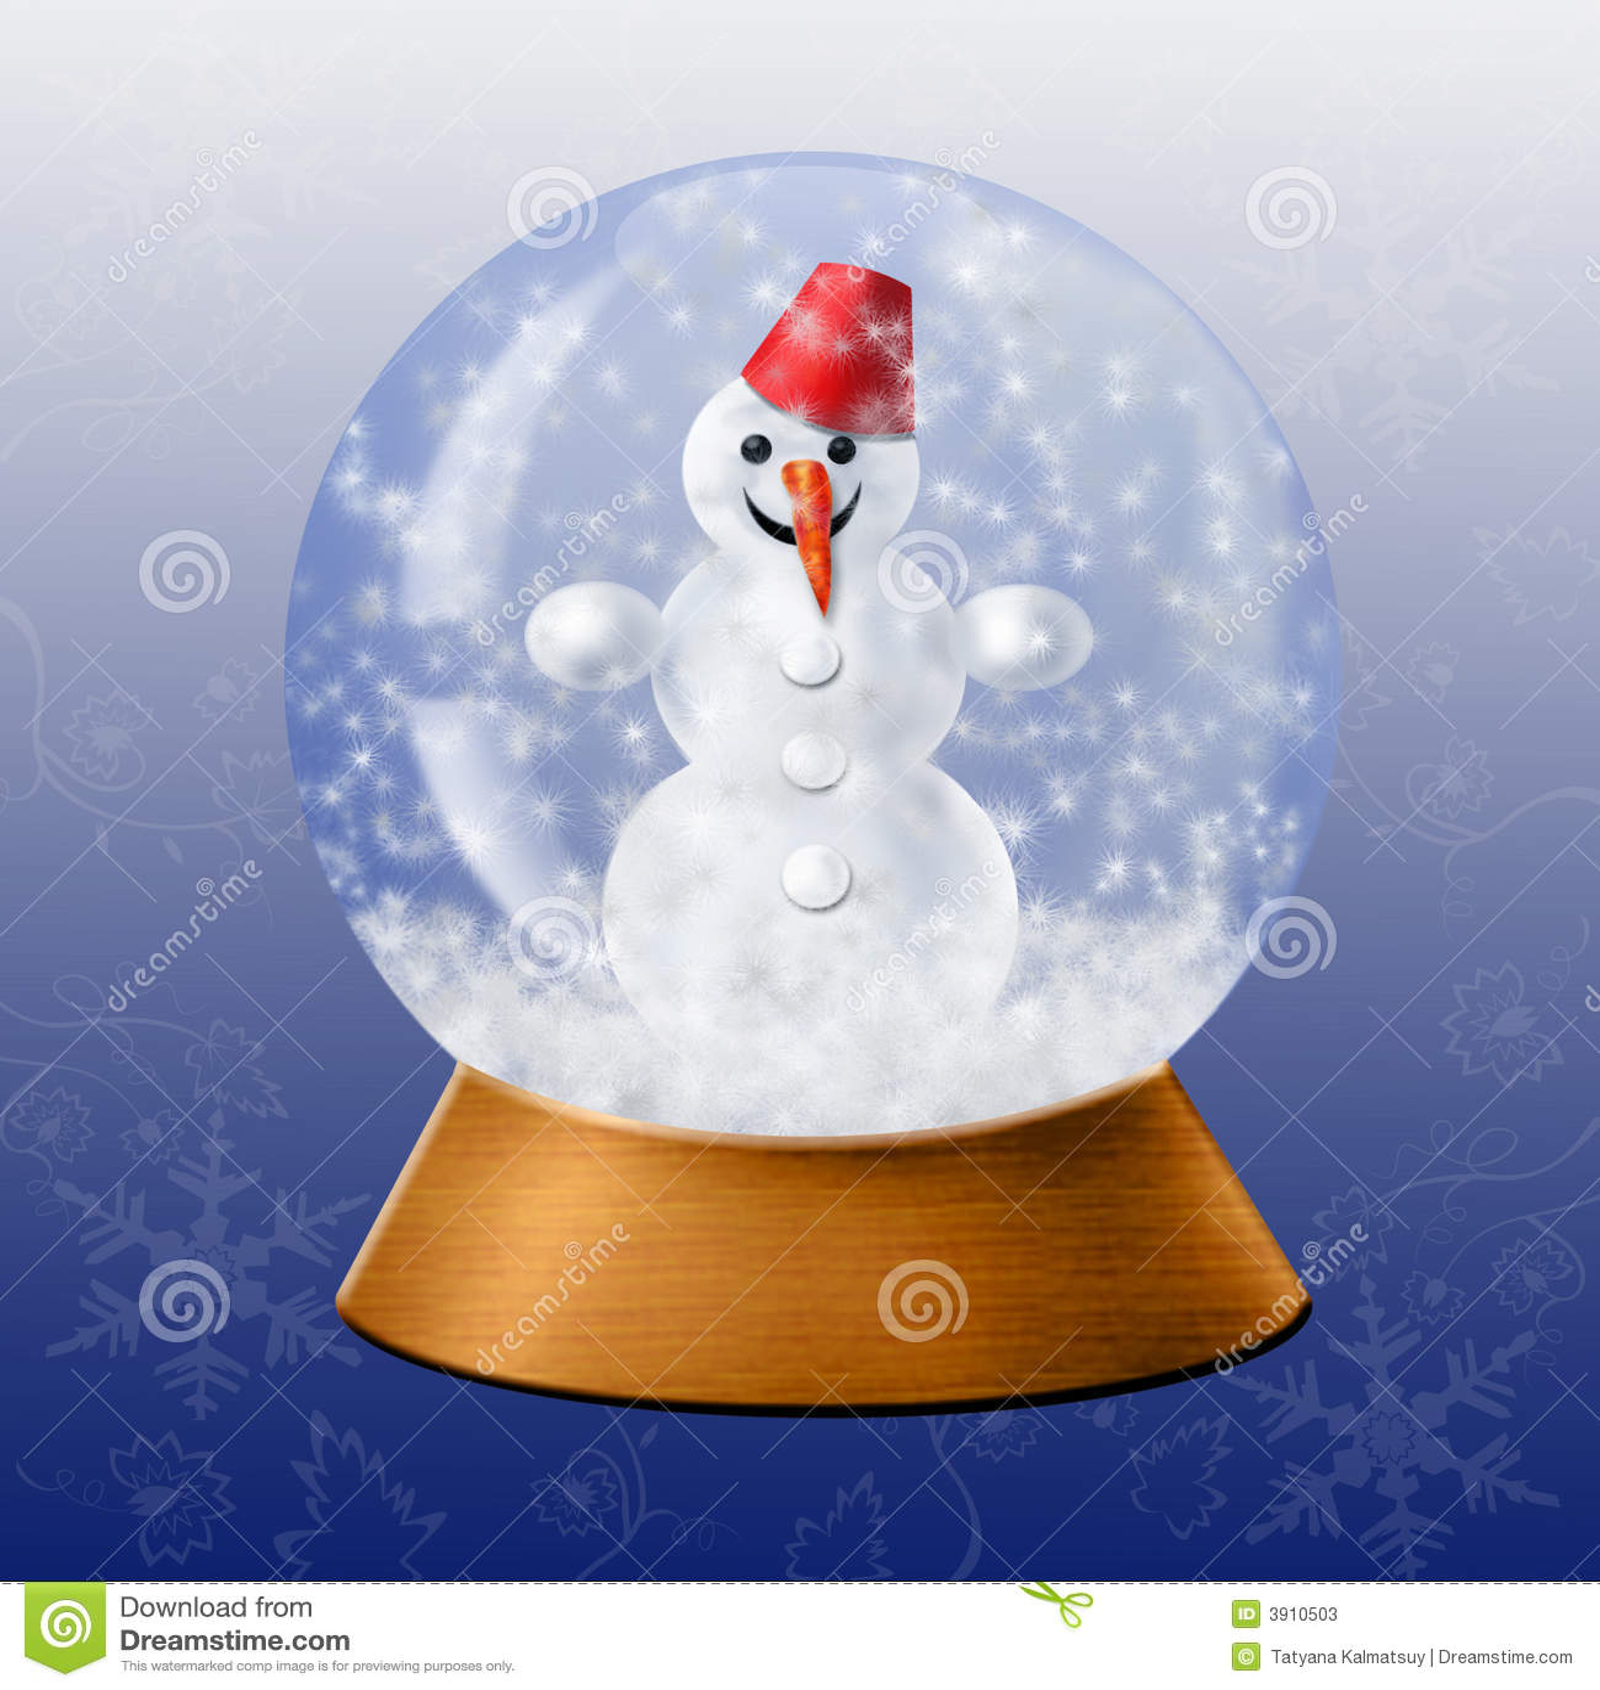 Glass Snow Ball Stock Photos Image 3910503